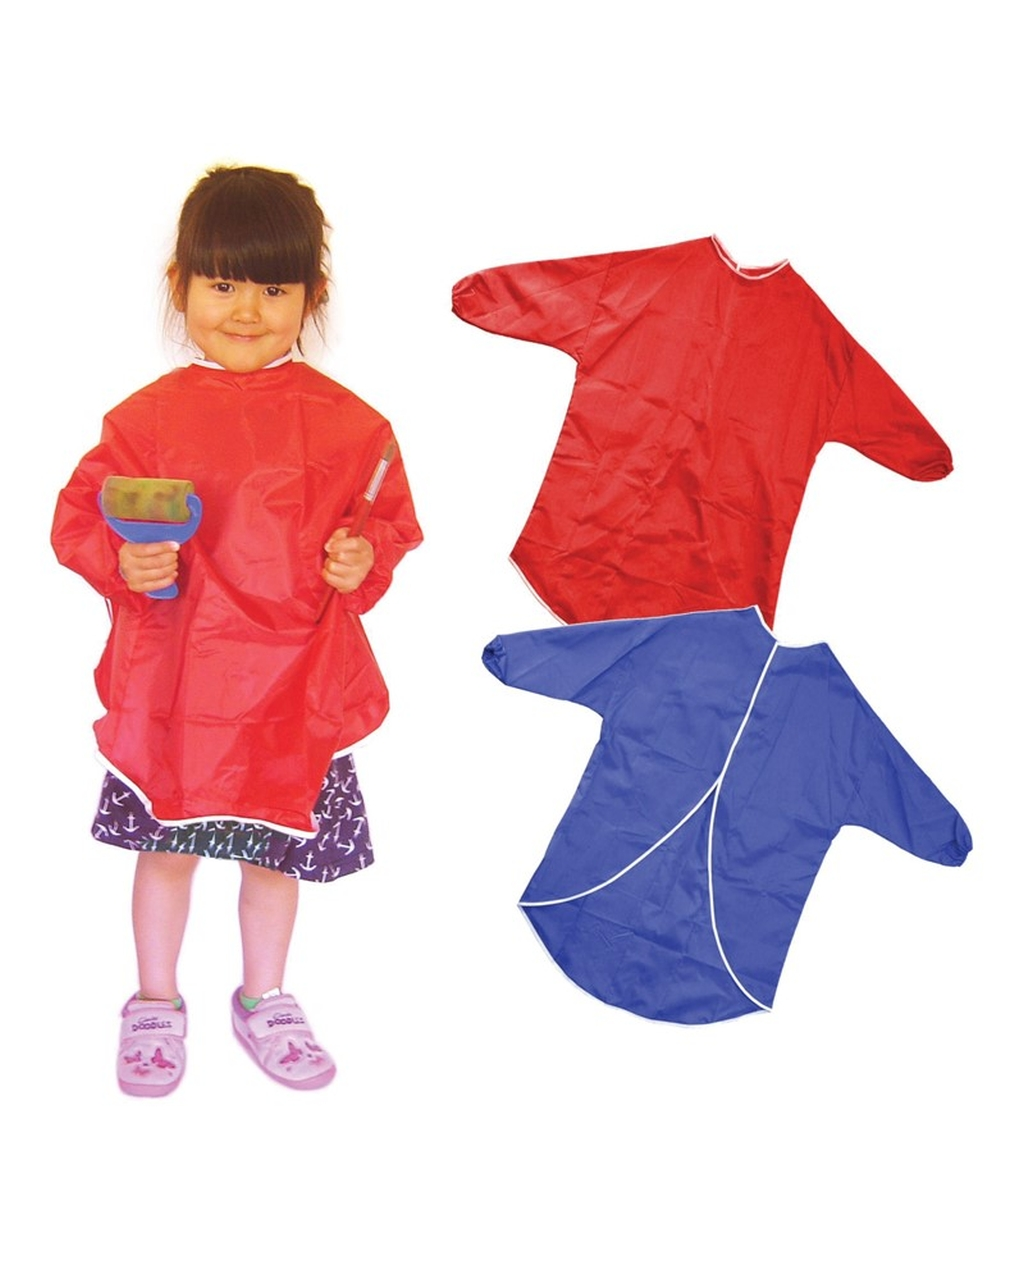 Children's Play Apron 86cm Red